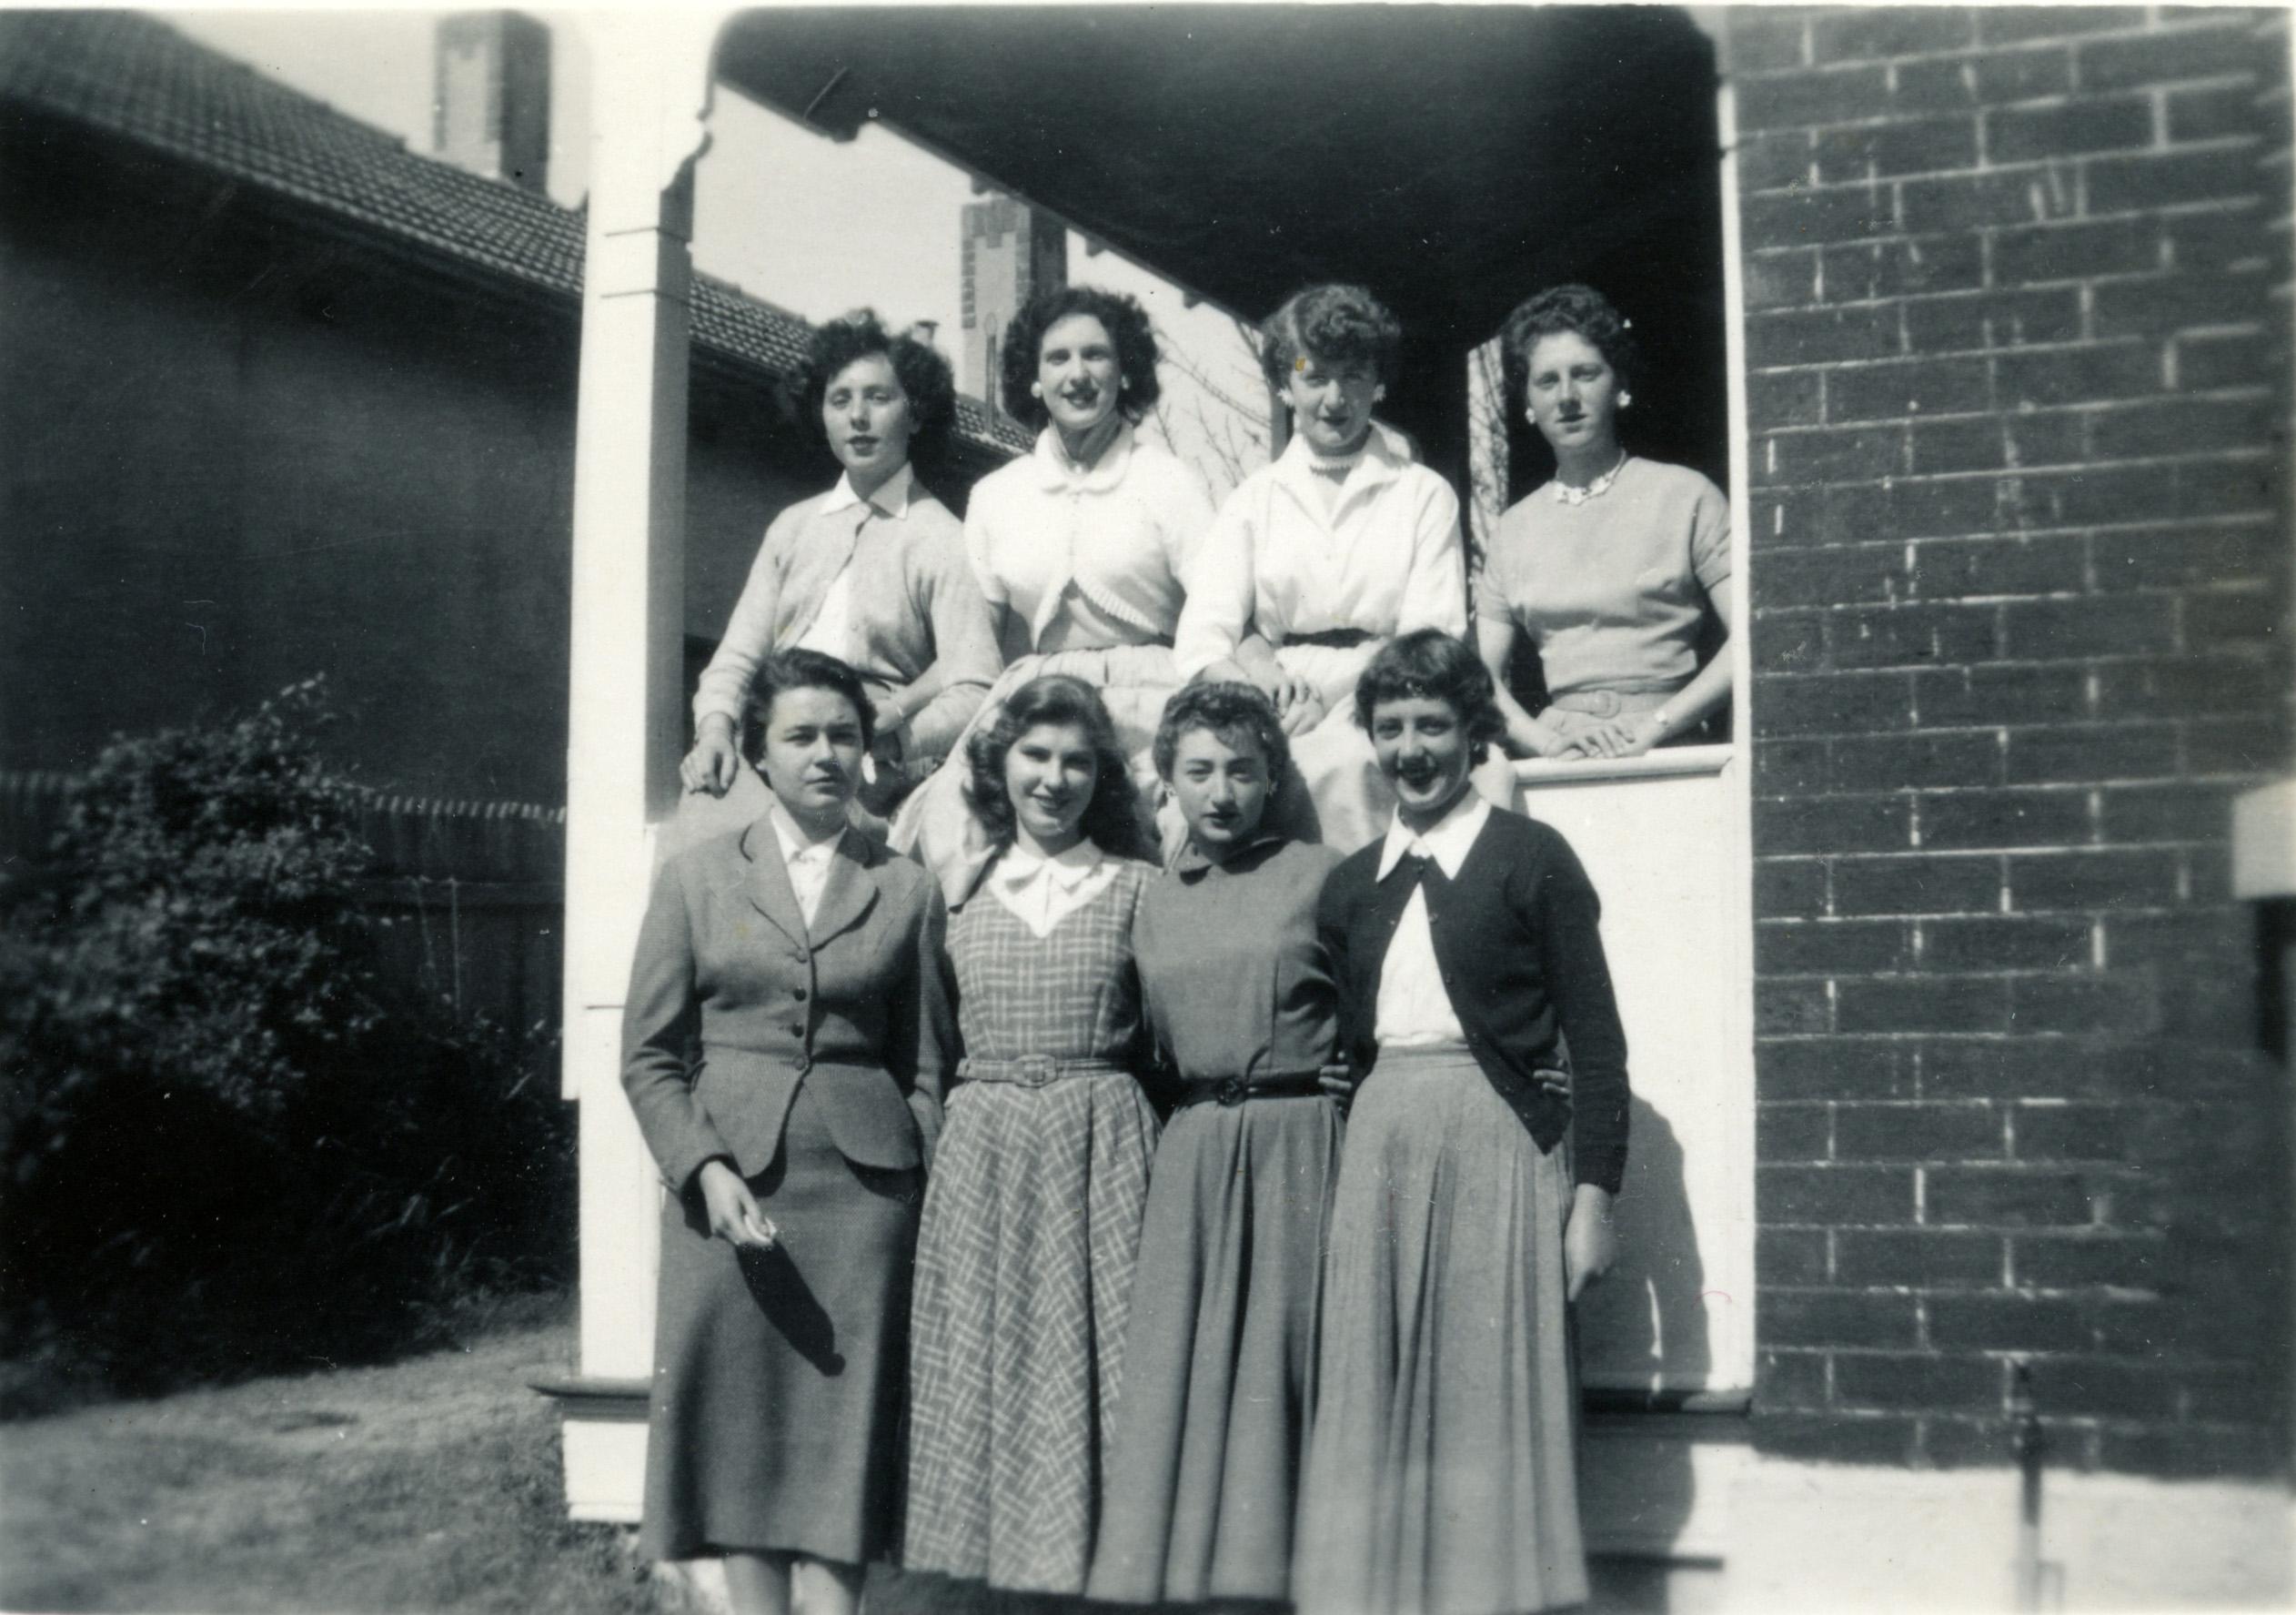 107. St Brigid's students, 1955